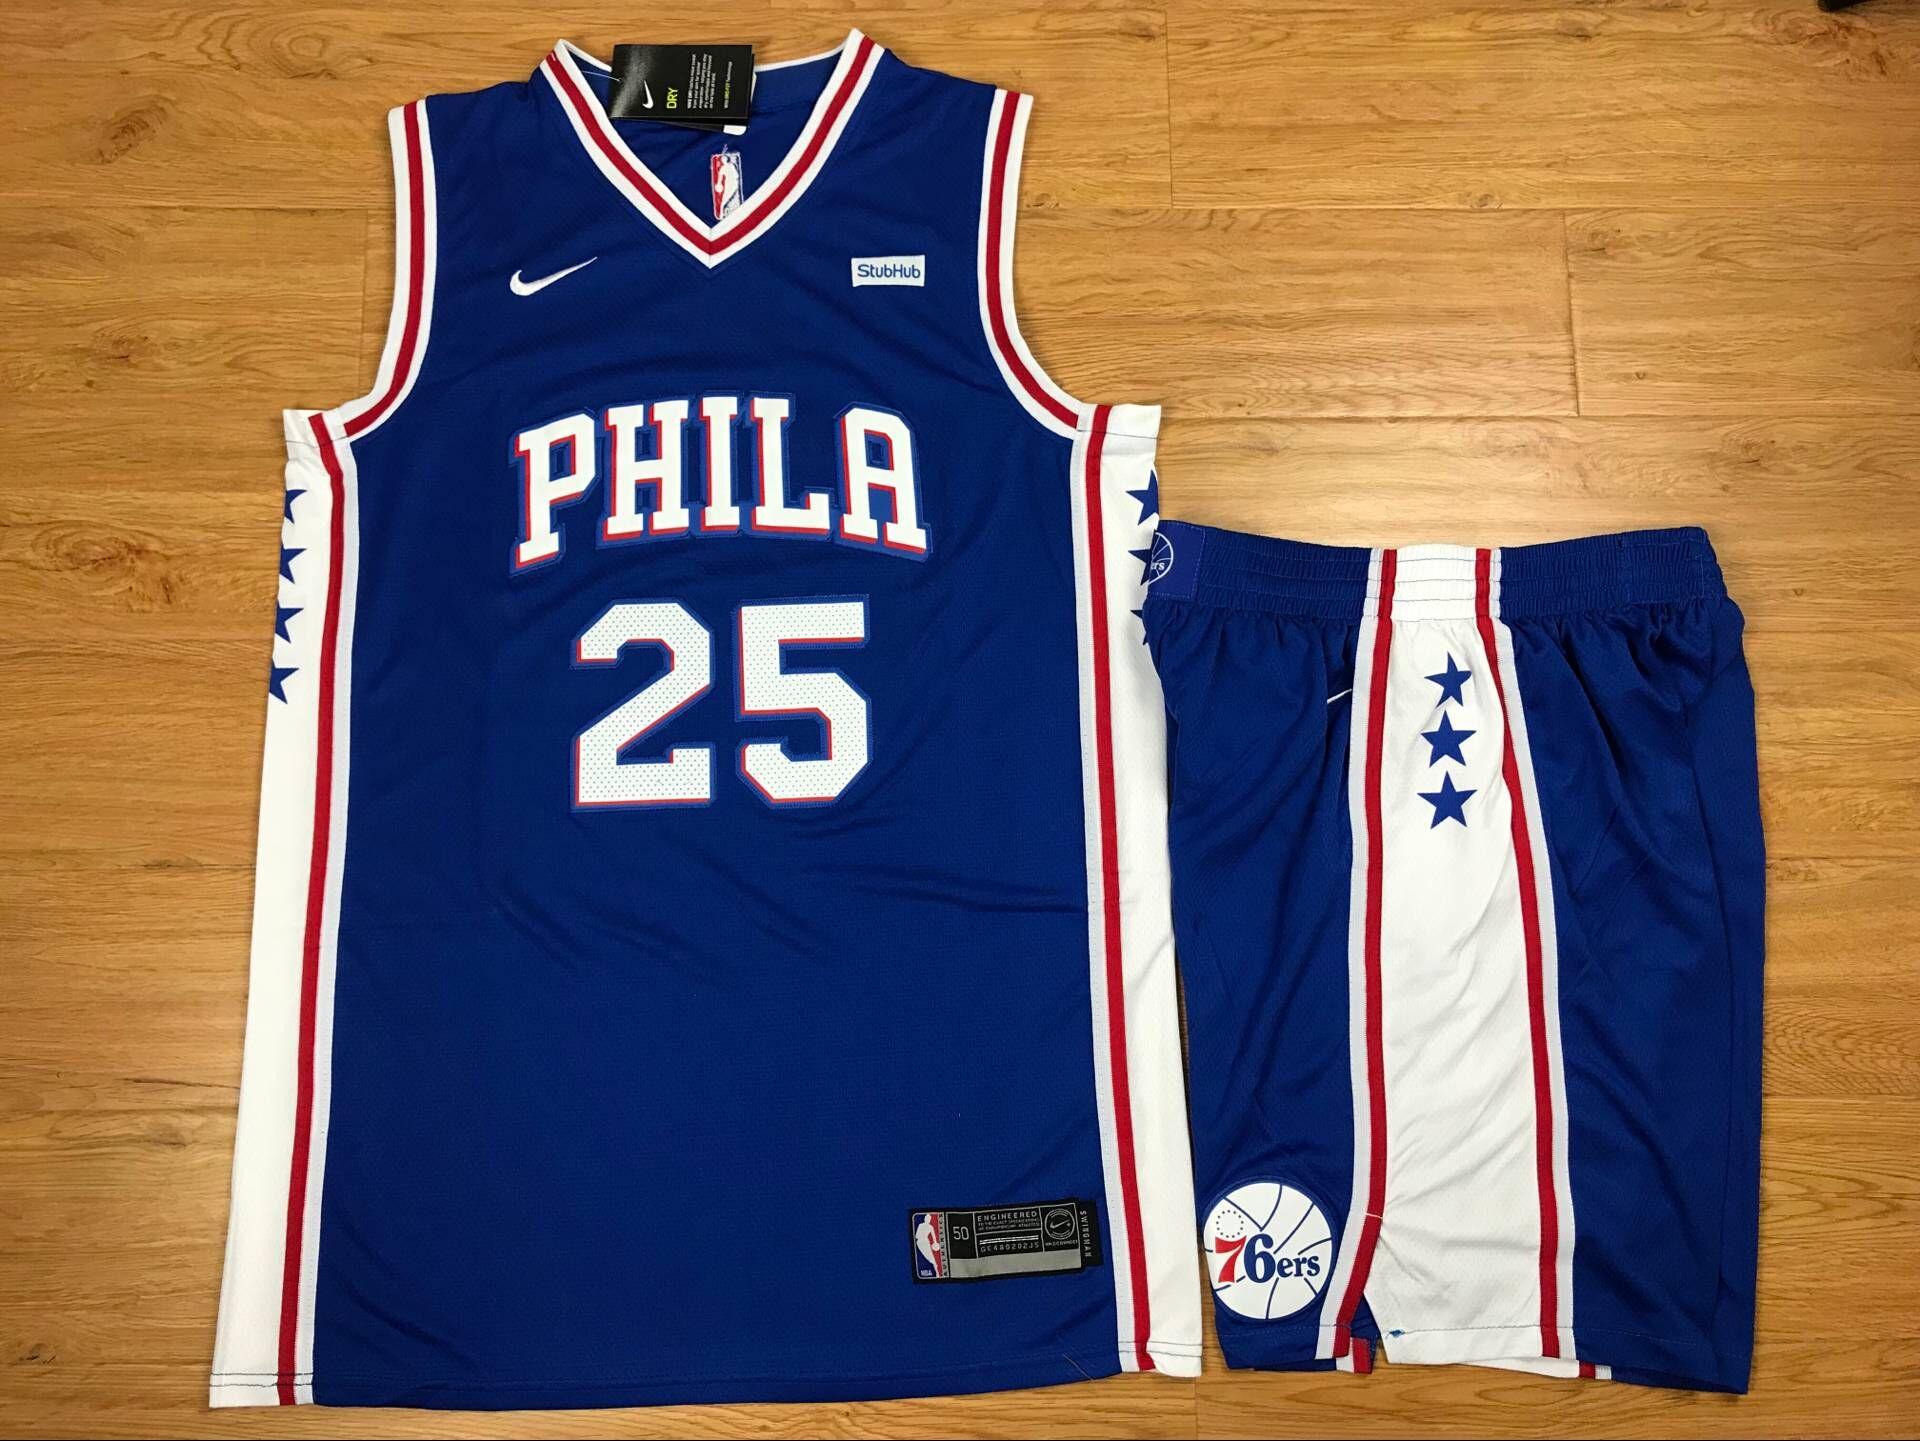 76ers 25 Ben Simmons Blue Nike Swingman Jersey(With Shorts)